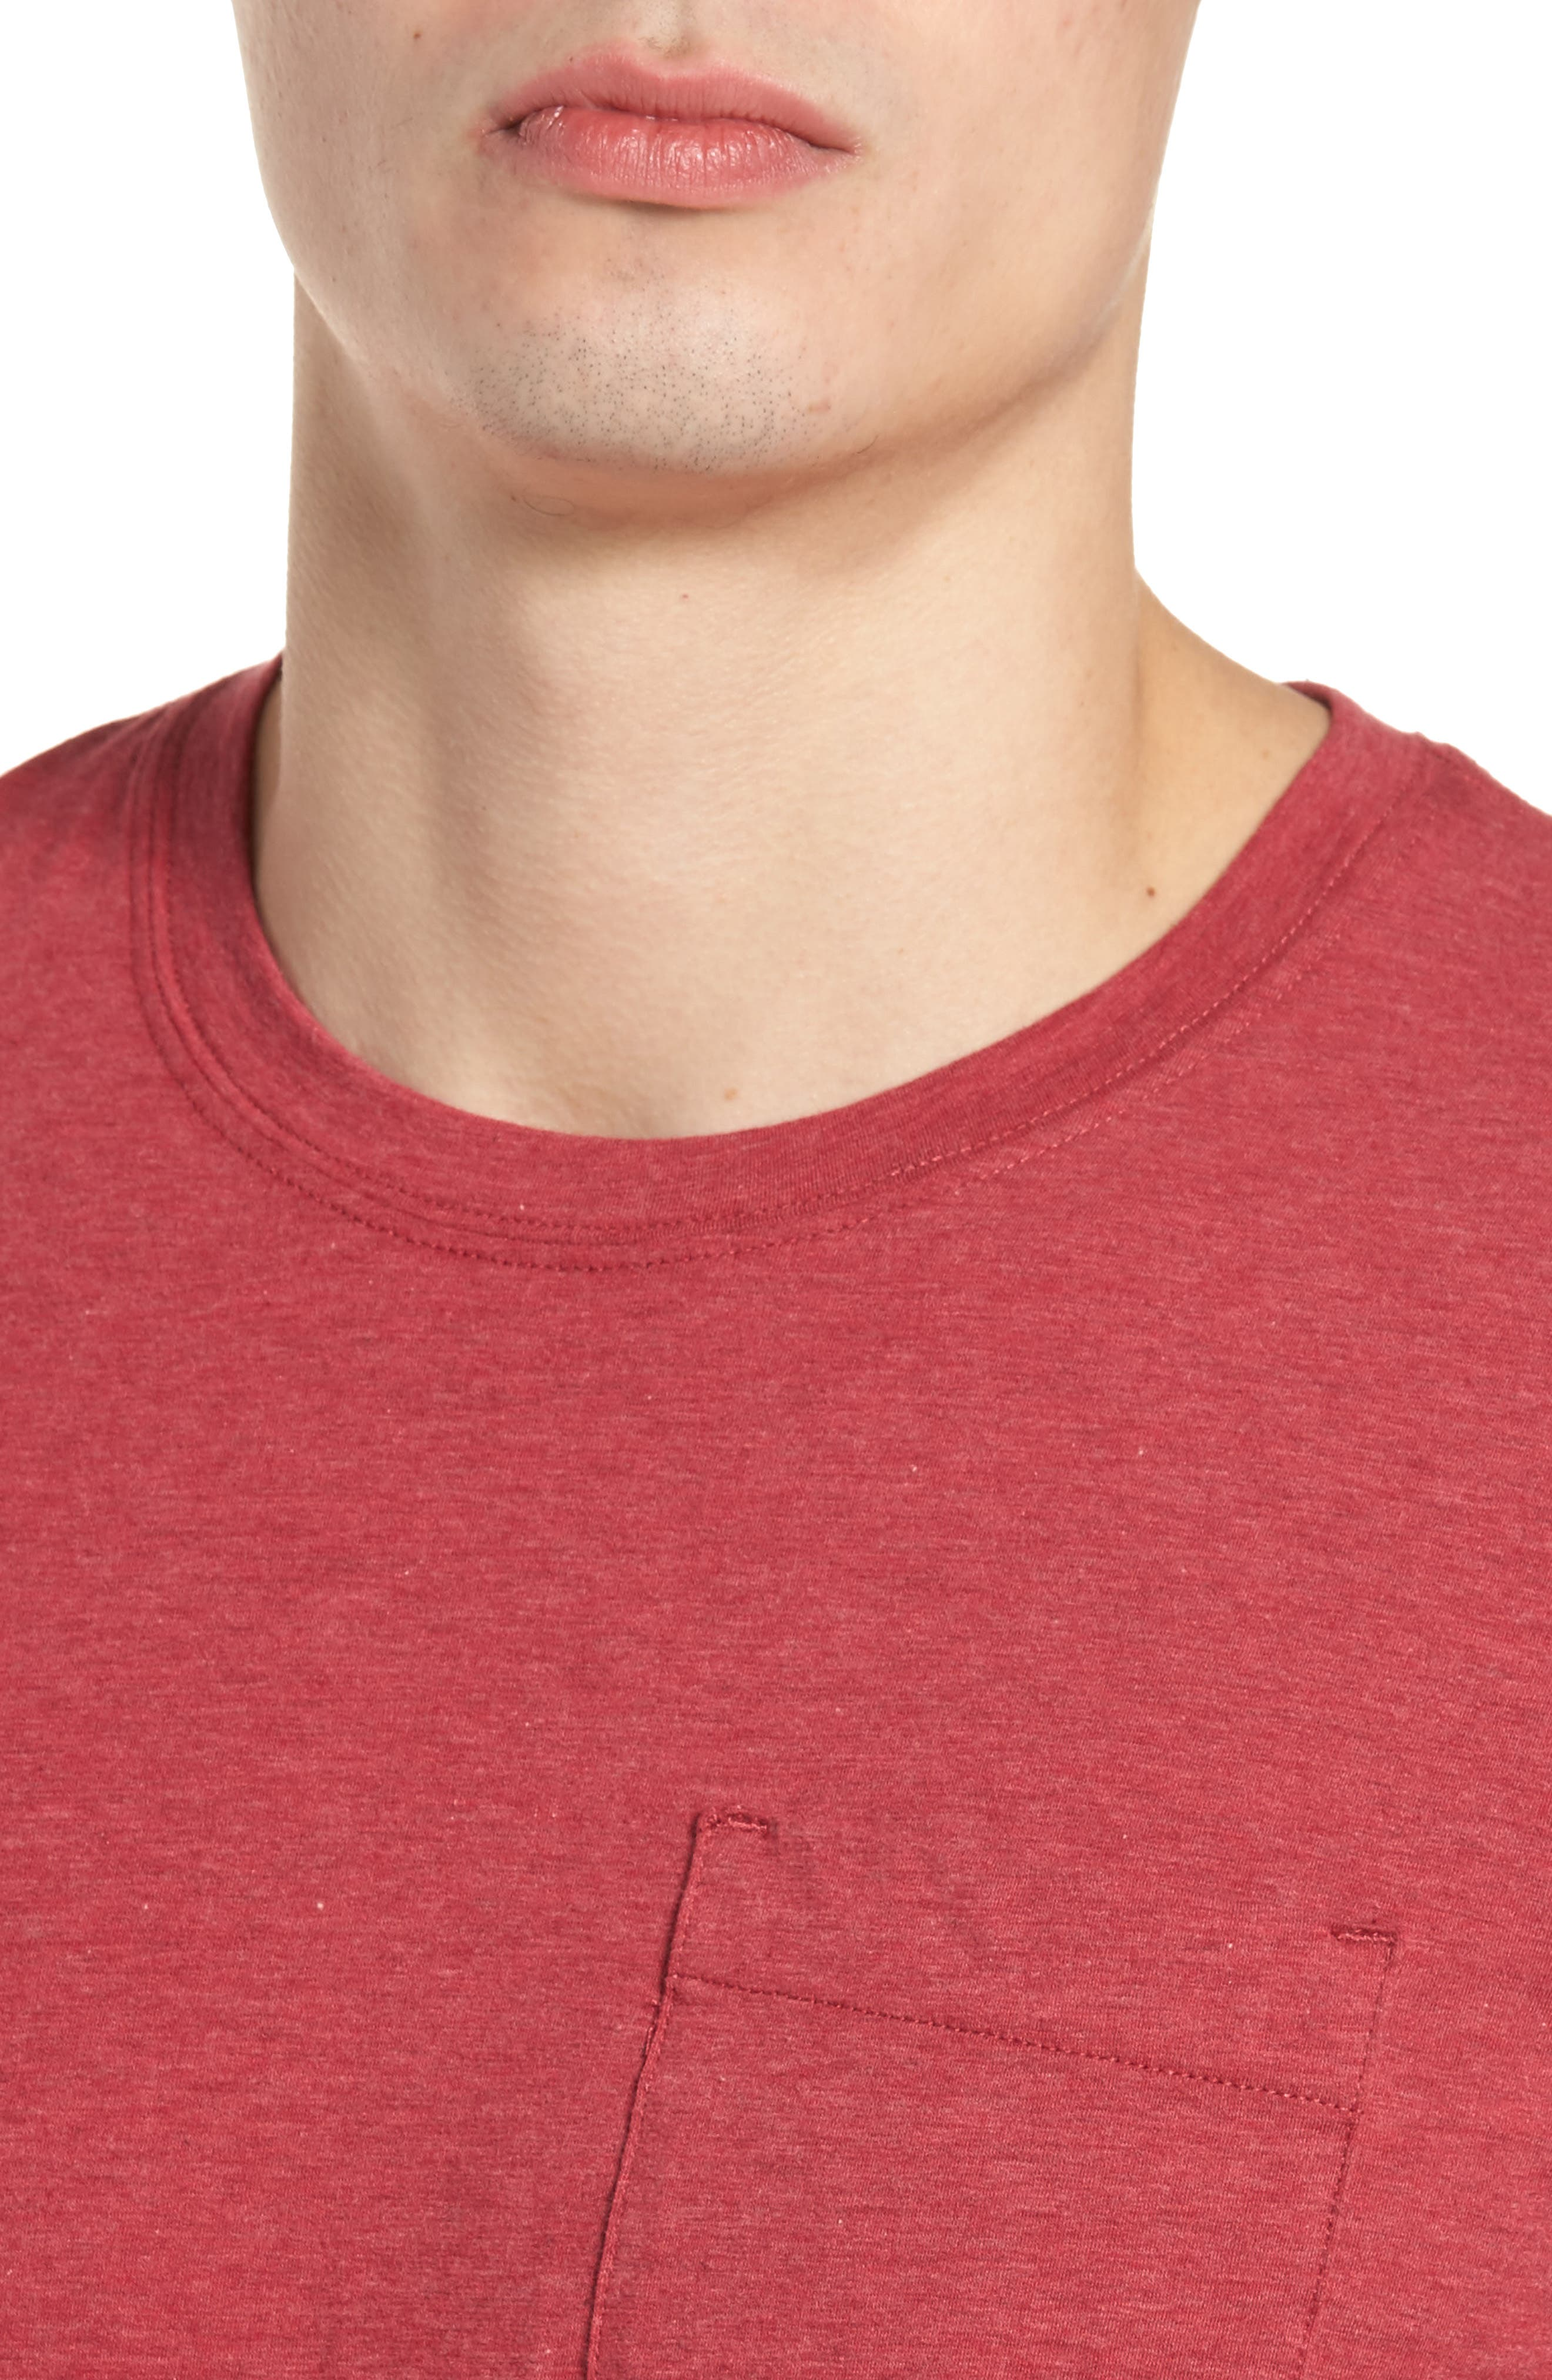 Hedrick T-Shirt,                             Alternate thumbnail 4, color,                             Heather Ox Blood